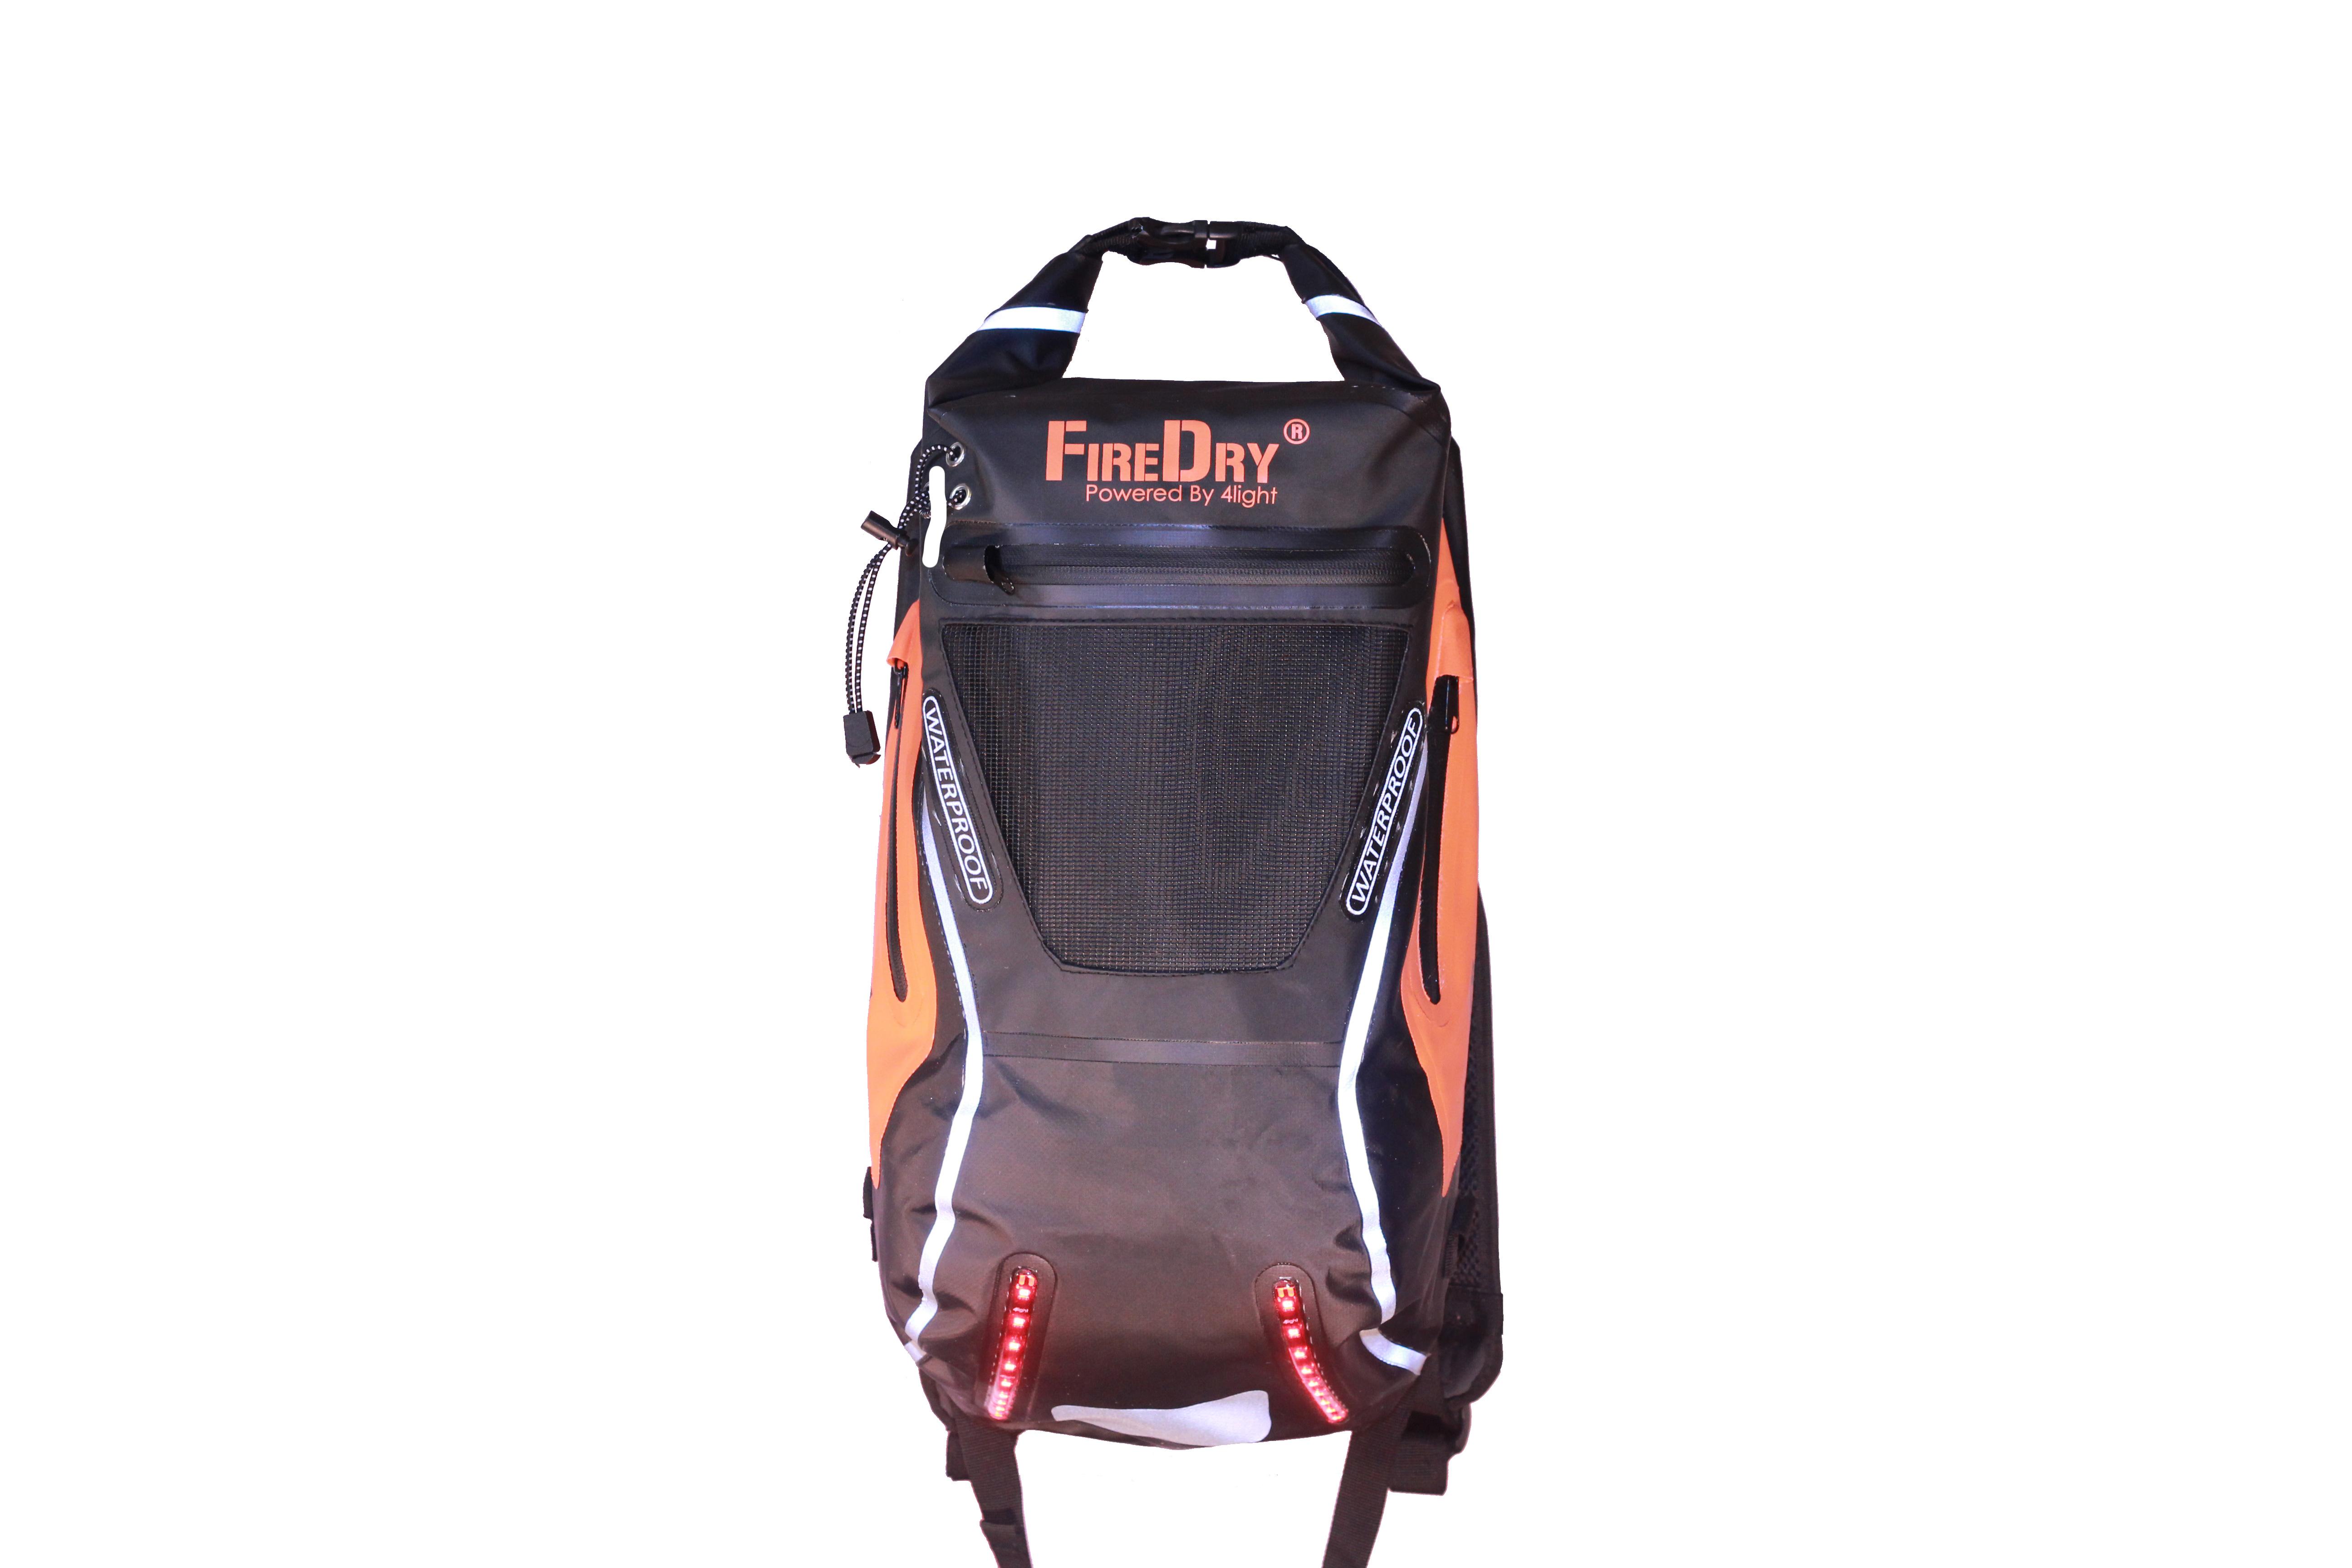 Ryggsäck Firedry svart/Orange